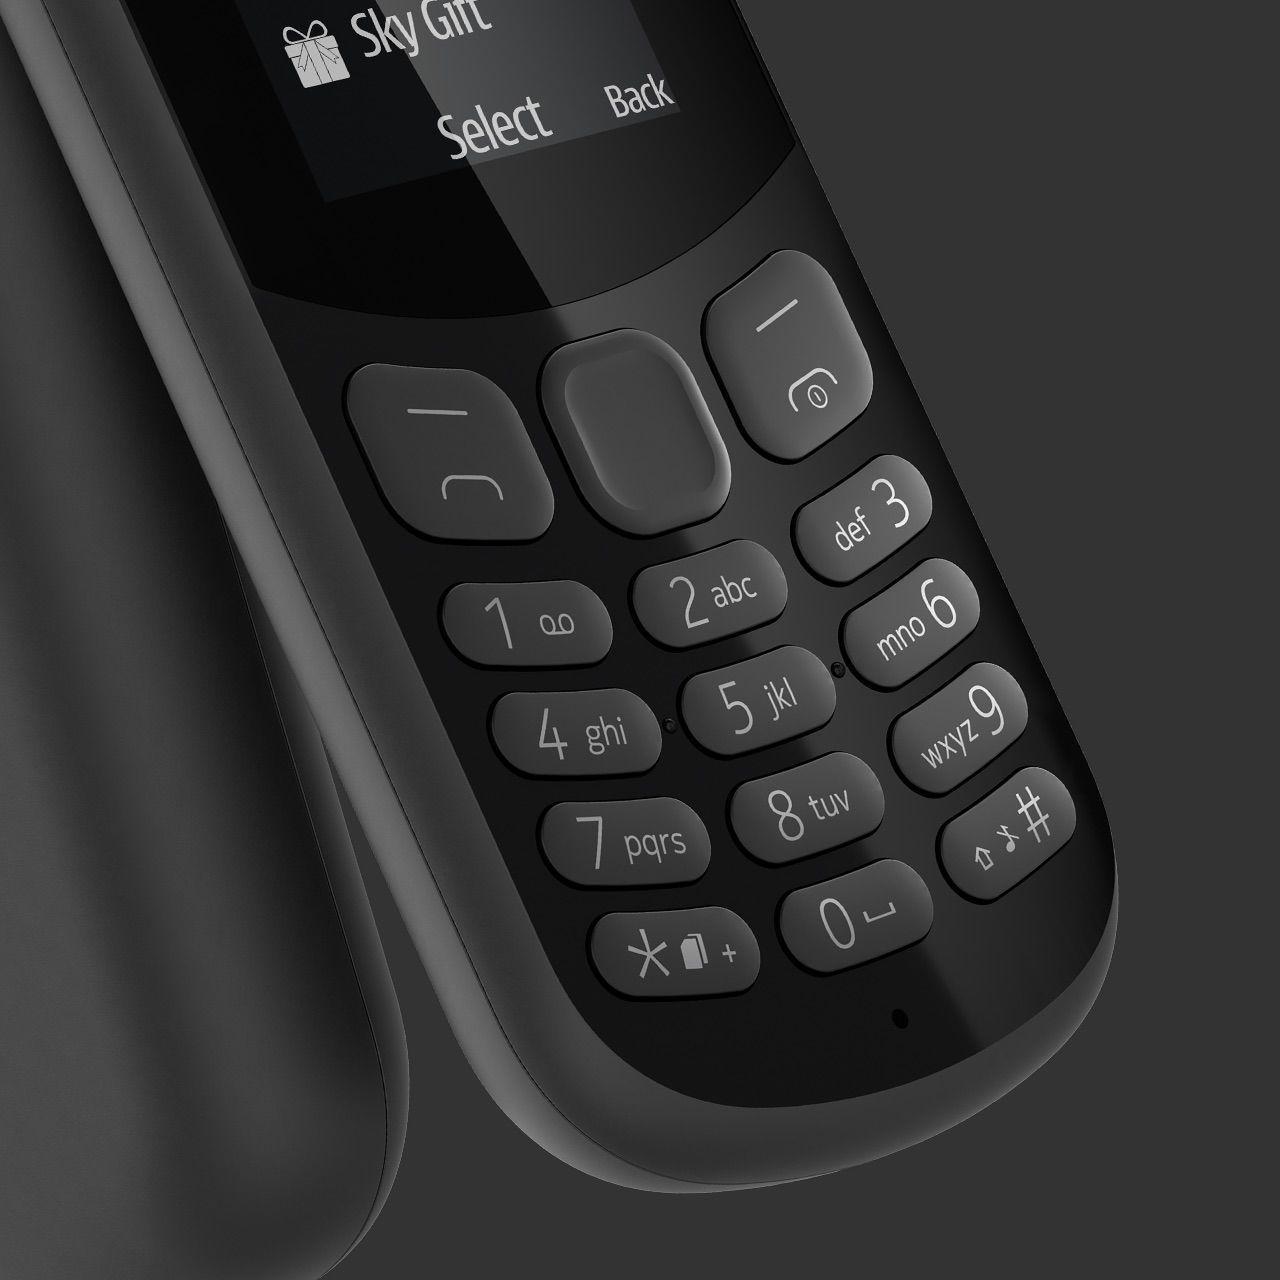 nokia_130-design_black-1280x1280.jpg